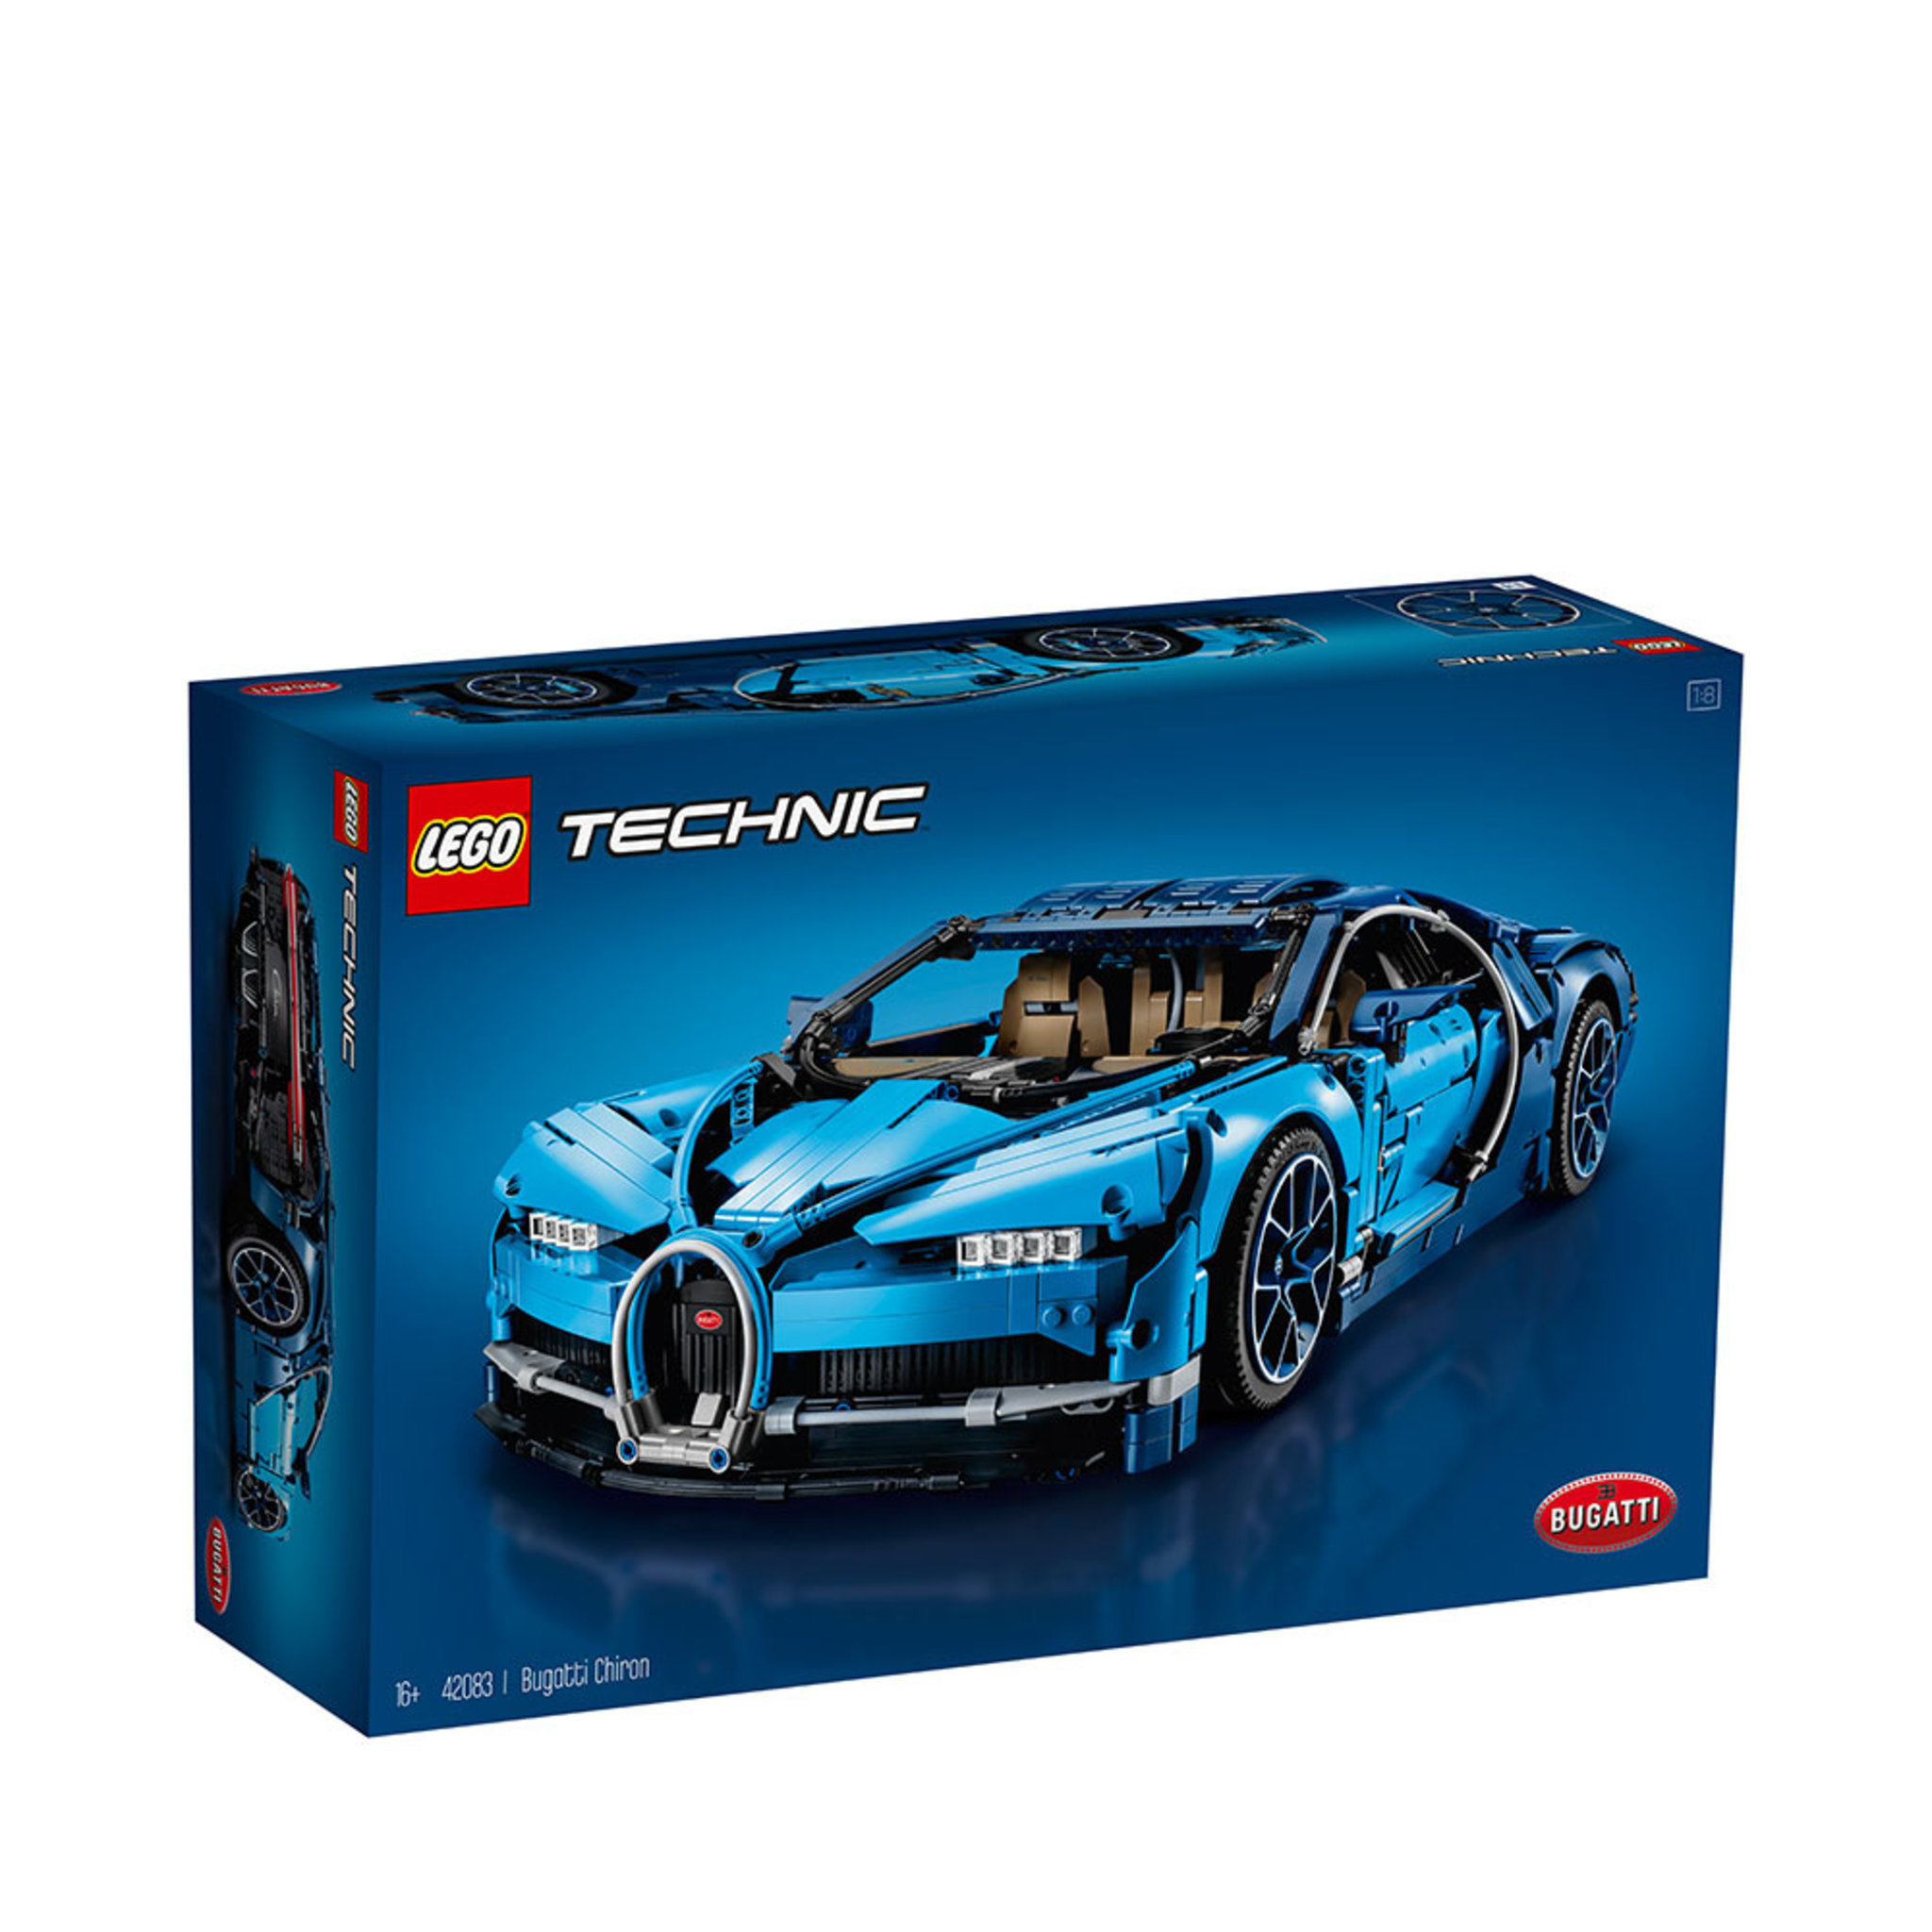 42083 Technic™ Bugatti Chiron - LEGO   DUPLO - Köp online på åhlens.se! 618e7cc0f4e17